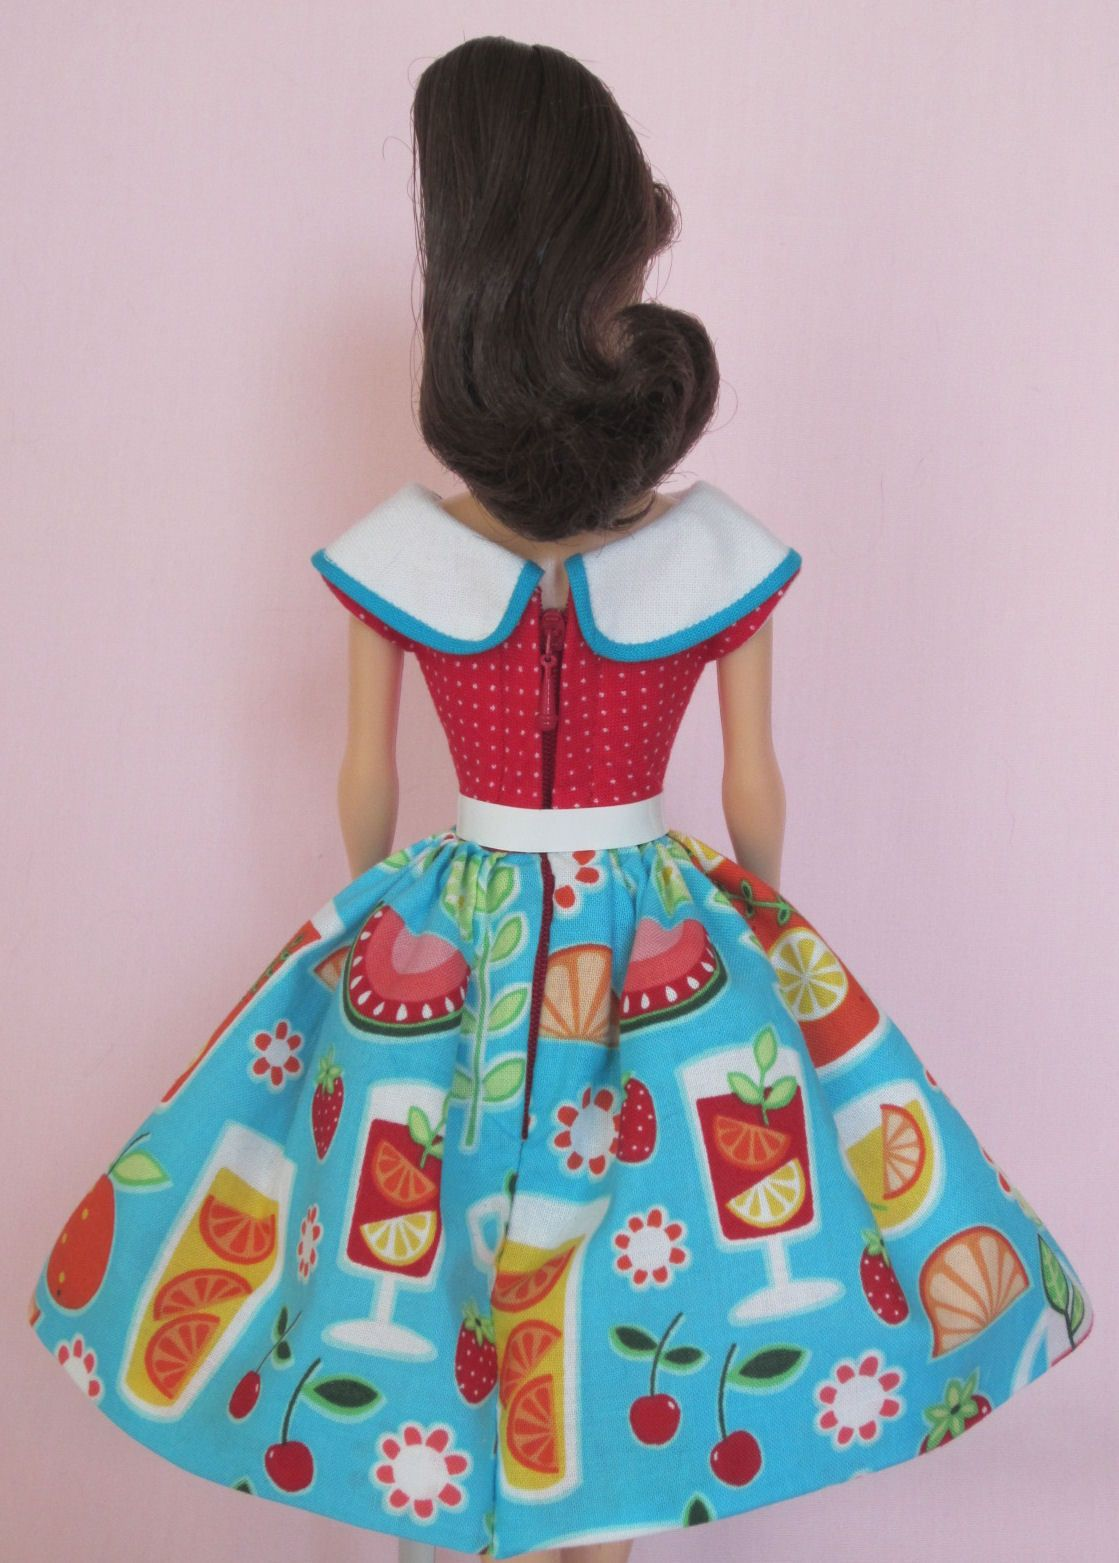 Vintage Barbie Doll Dress Reproduction Repro Barbie Clothes by Eggie ...